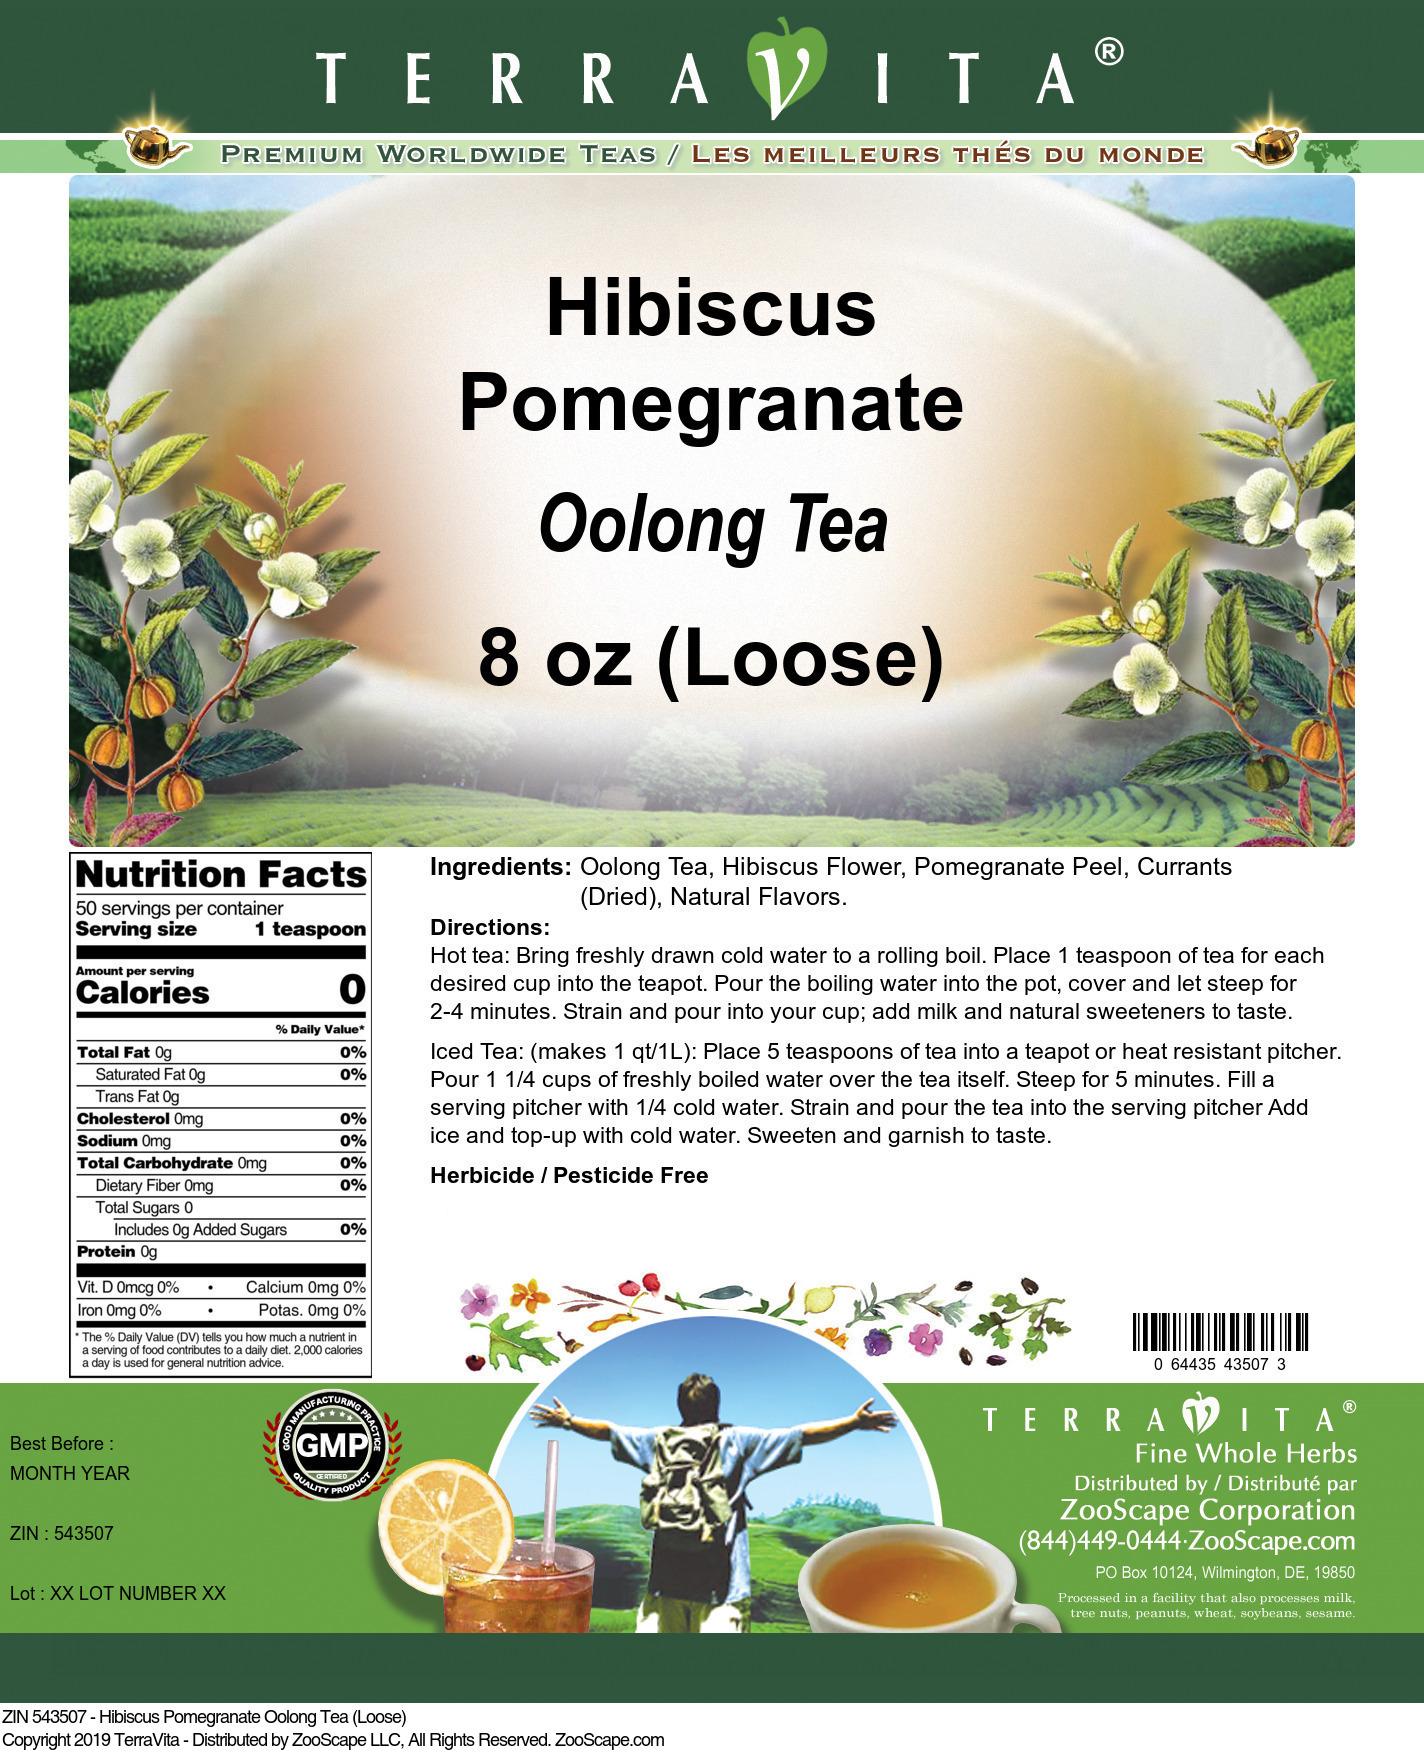 Hibiscus Pomegranate Oolong Tea (Loose)